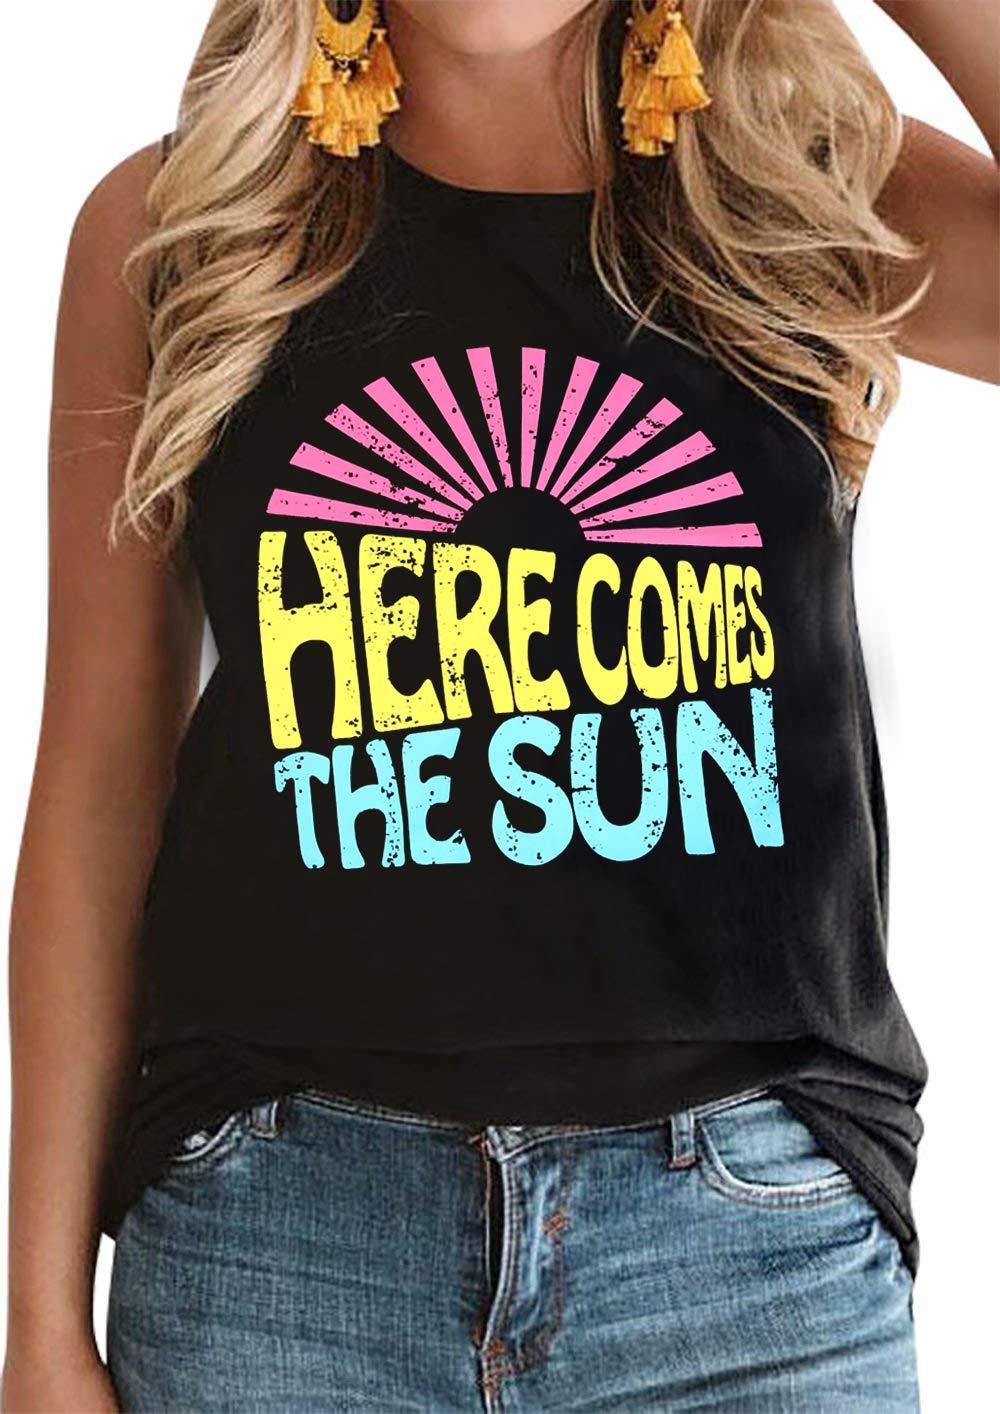 DUTUT Here Comes The Sun Tank Top Women Funny Sun Graphic Tops Beach Vacation Sleeveless Shirt Summer Beach Casual Tanks